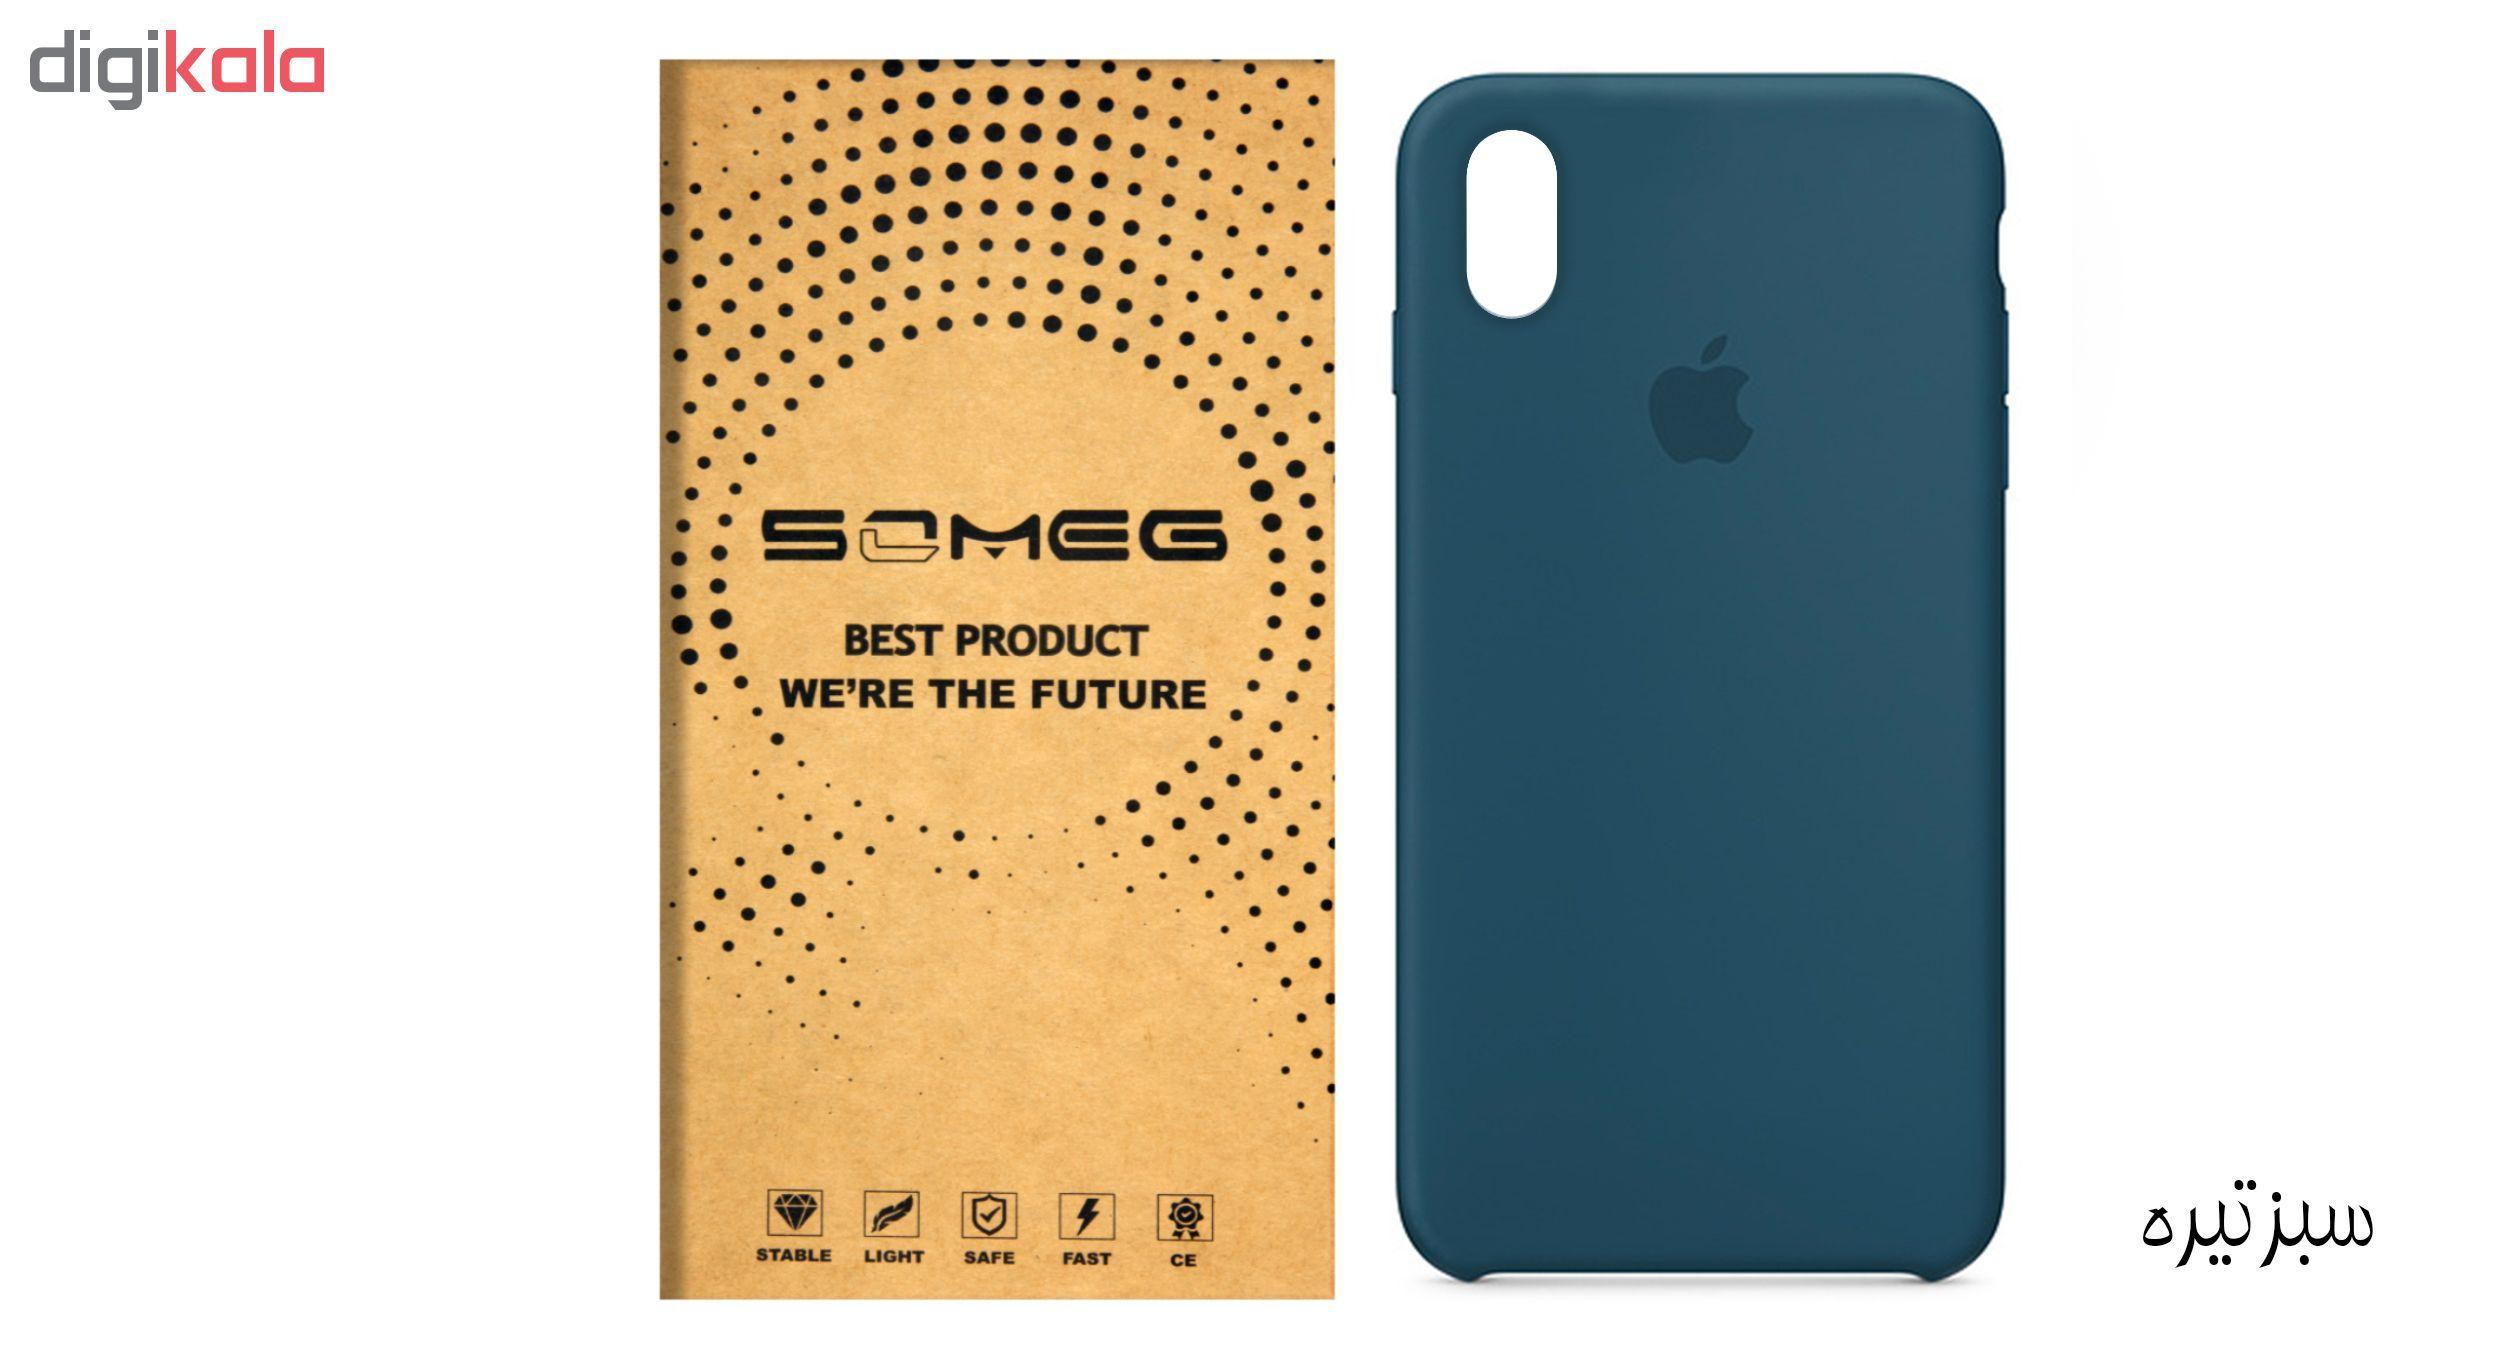 کاور سومگ مدل SIC مناسب برای گوشی موبایل اپل iPhone X  main 1 28